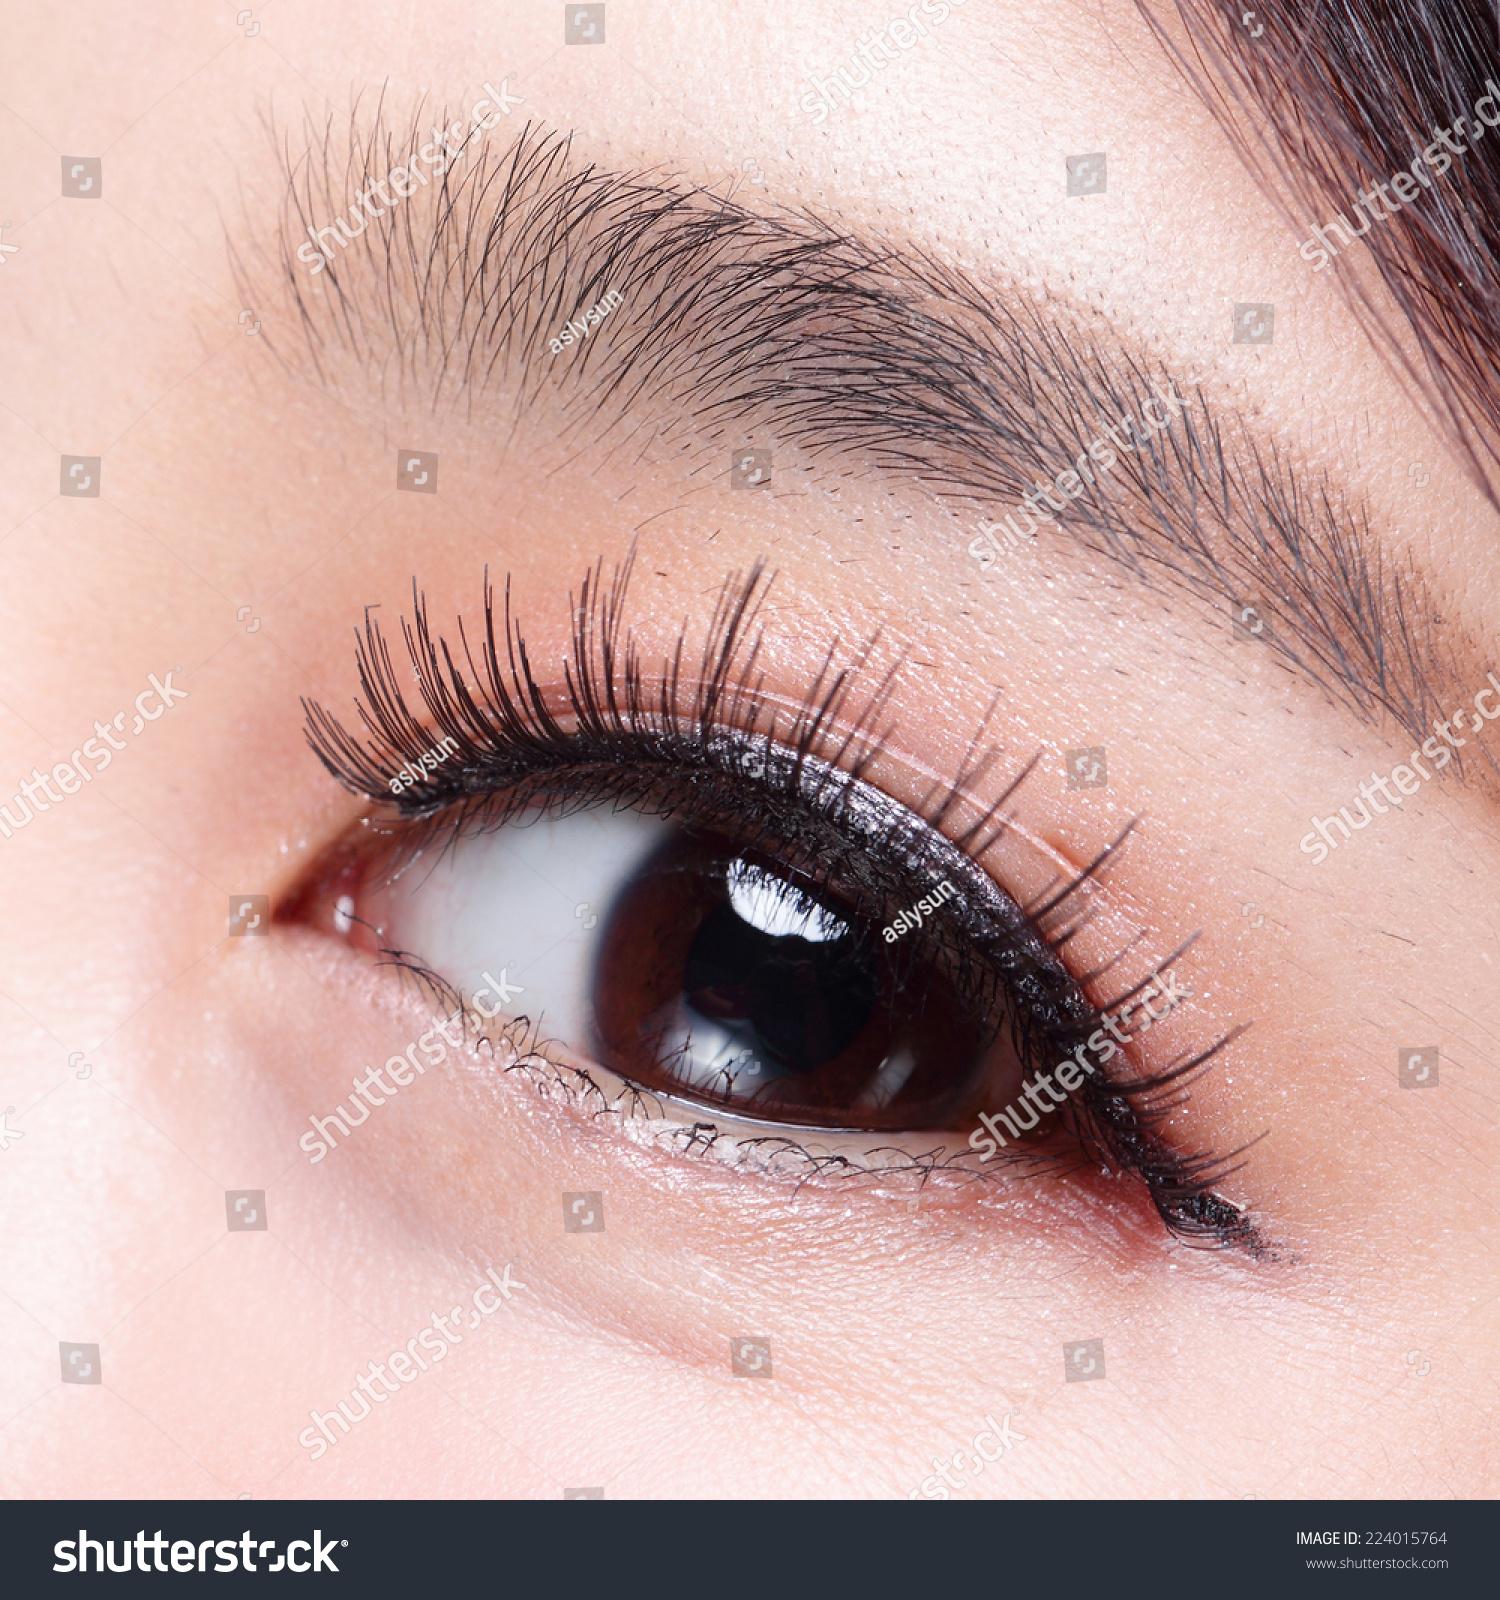 Beautiful Woman Eye Long Eyelashes Asian Stock Photo 224015764 ...